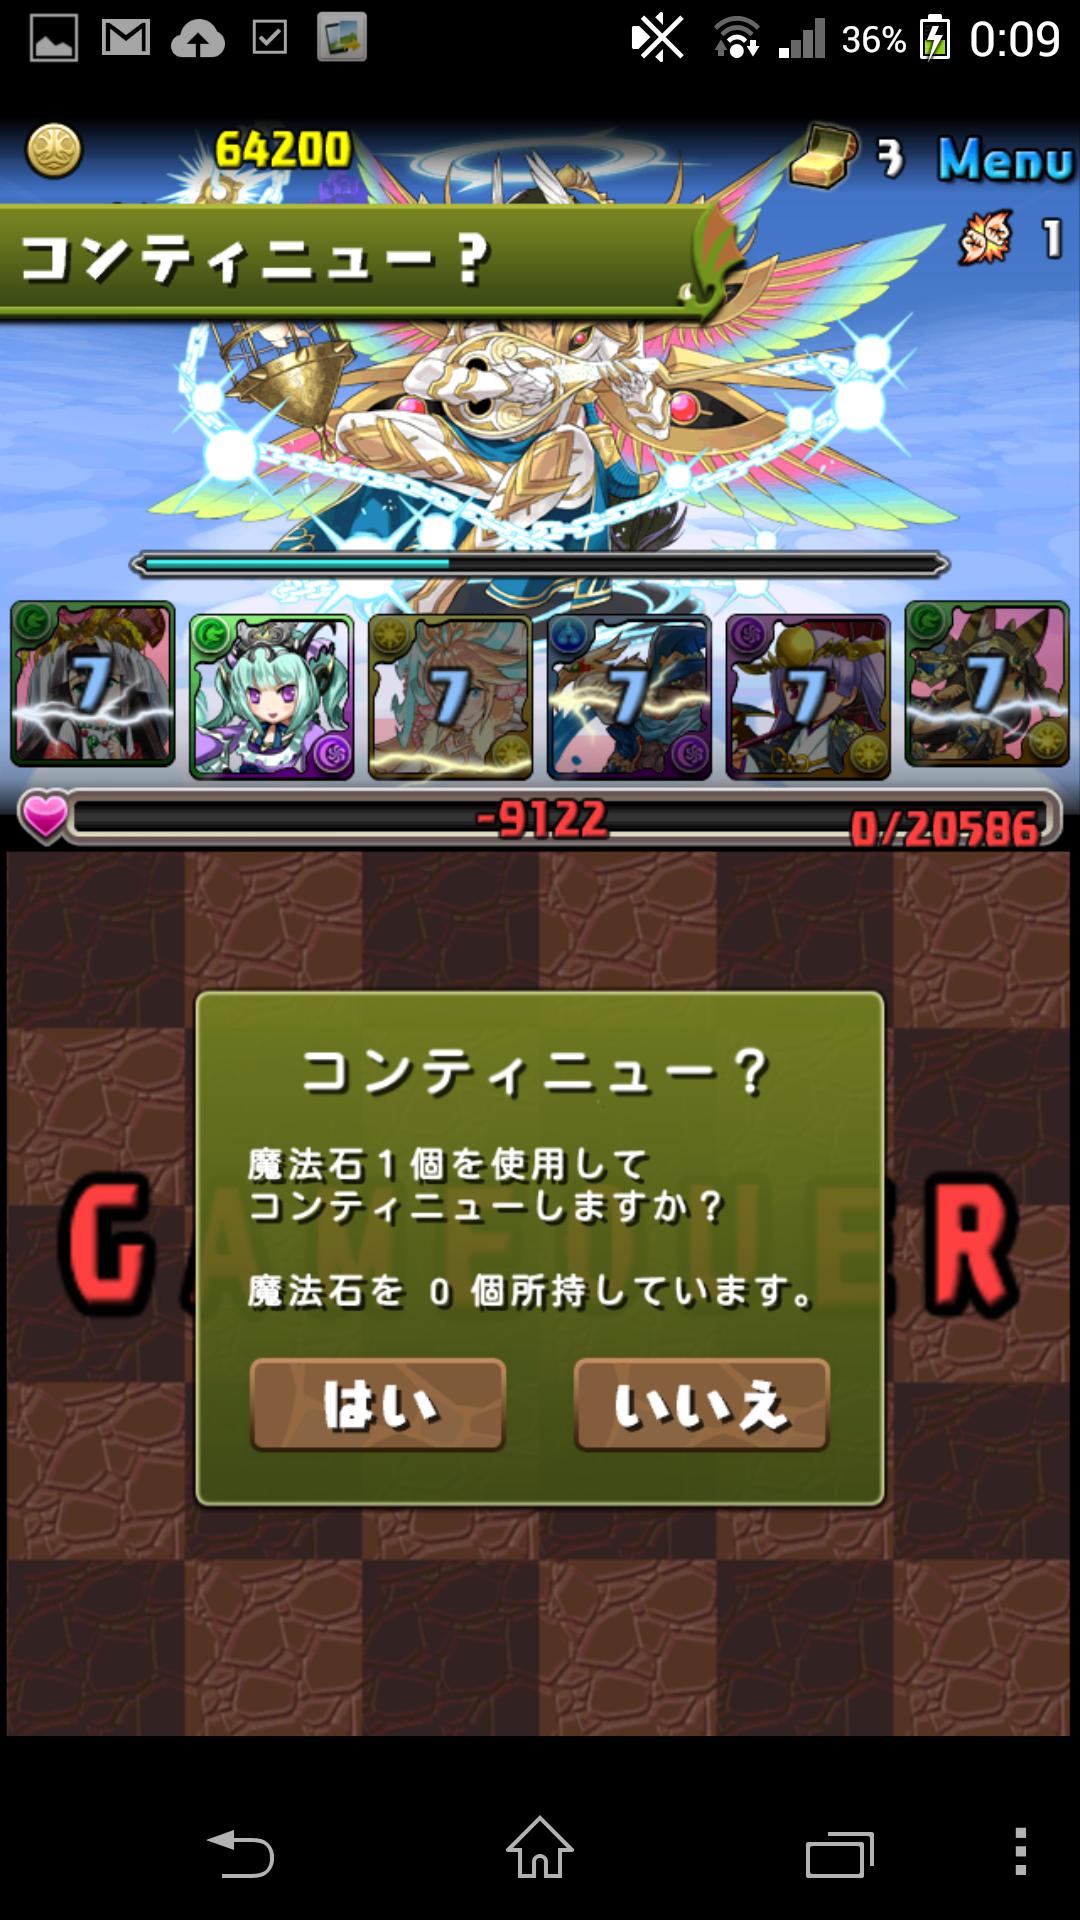 Screenshot_2014-03-28-00-09-13.png